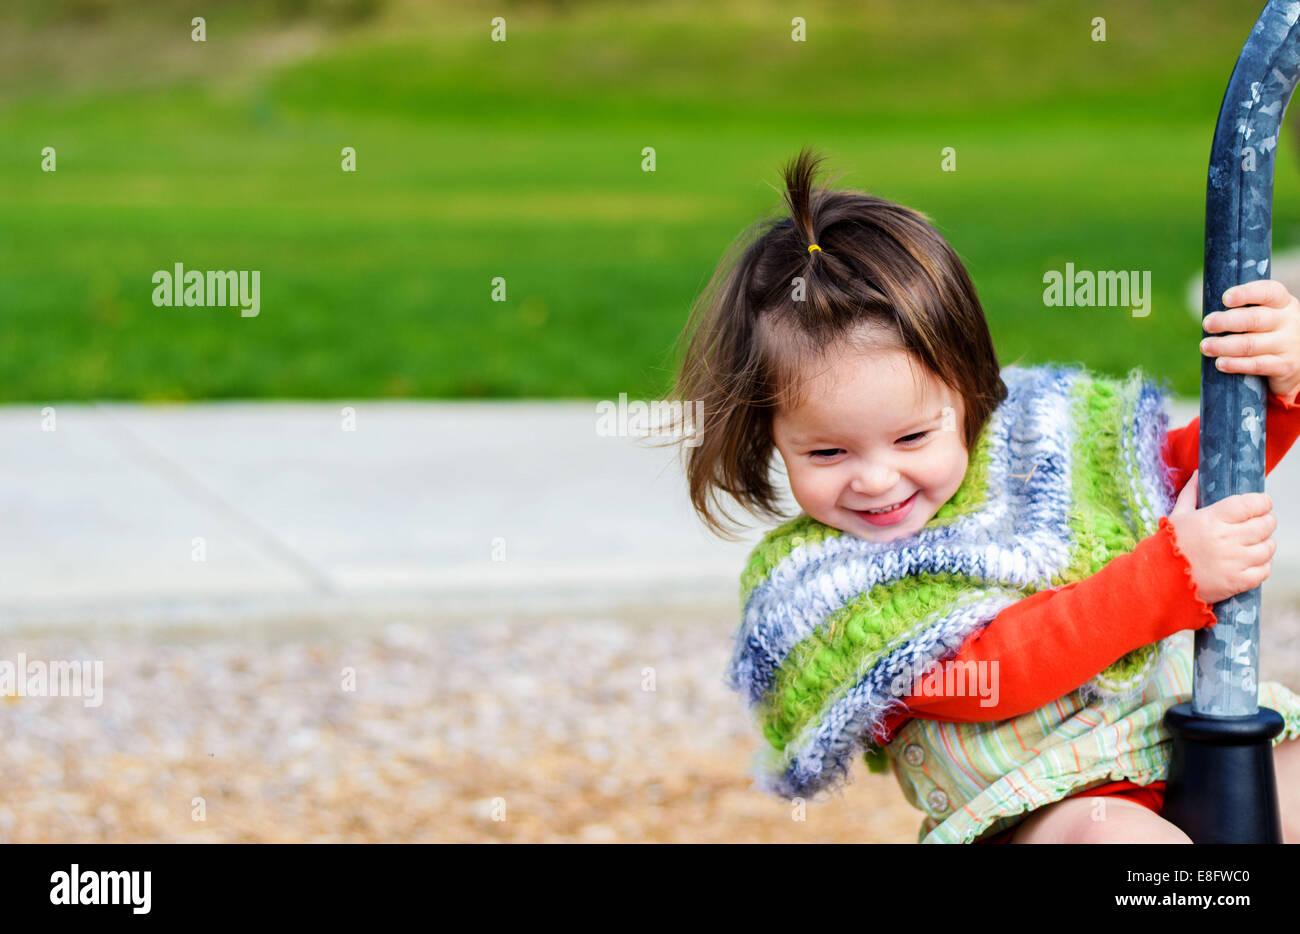 Chica de área infantil (2-3 años) Imagen De Stock